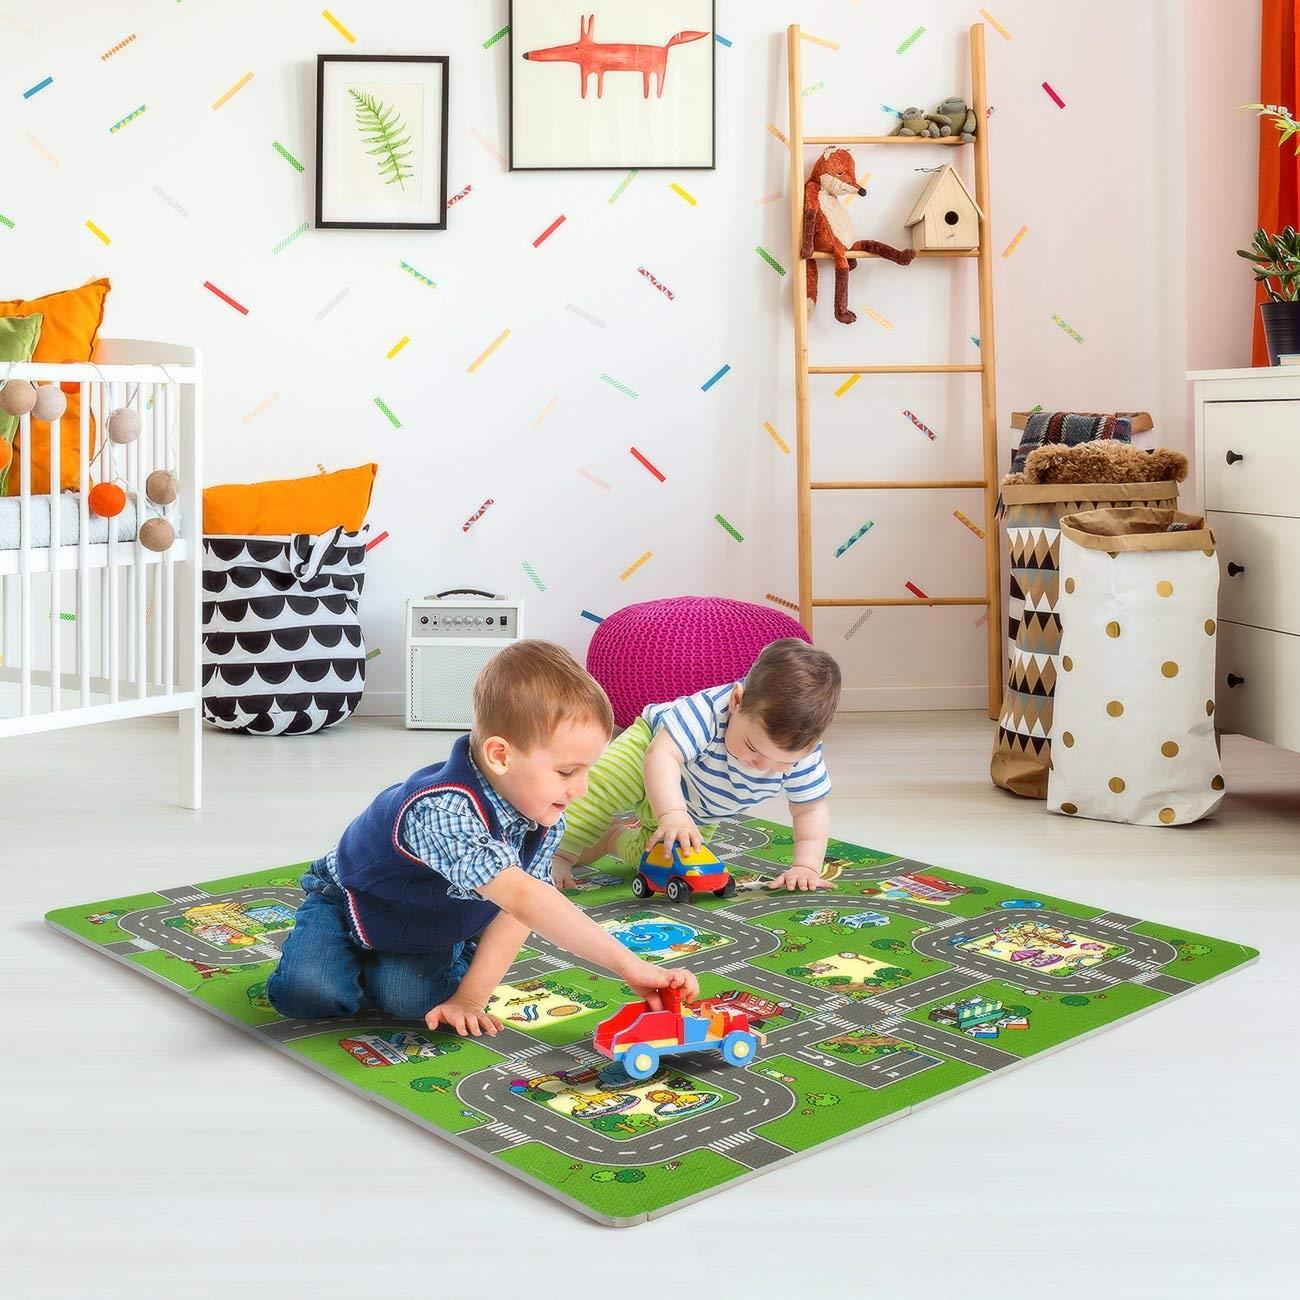 Traffic Play mat Puzzle Foam Interlocking Tiles